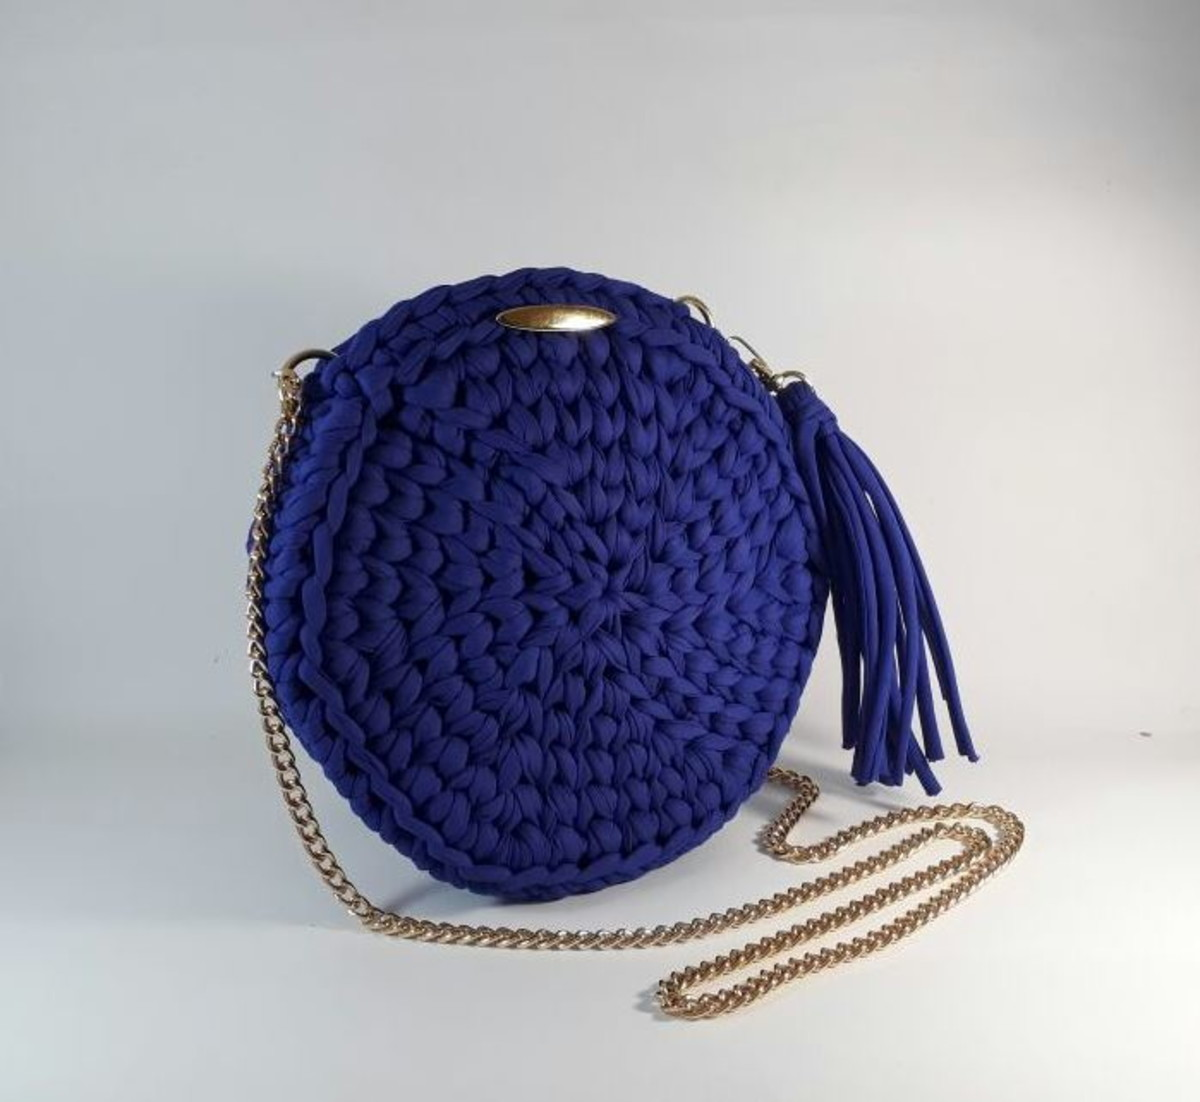 9d04cceb0cb Bolsa de crochet redonda azul no Elo7 | Jô Maia Artes (C2C482)